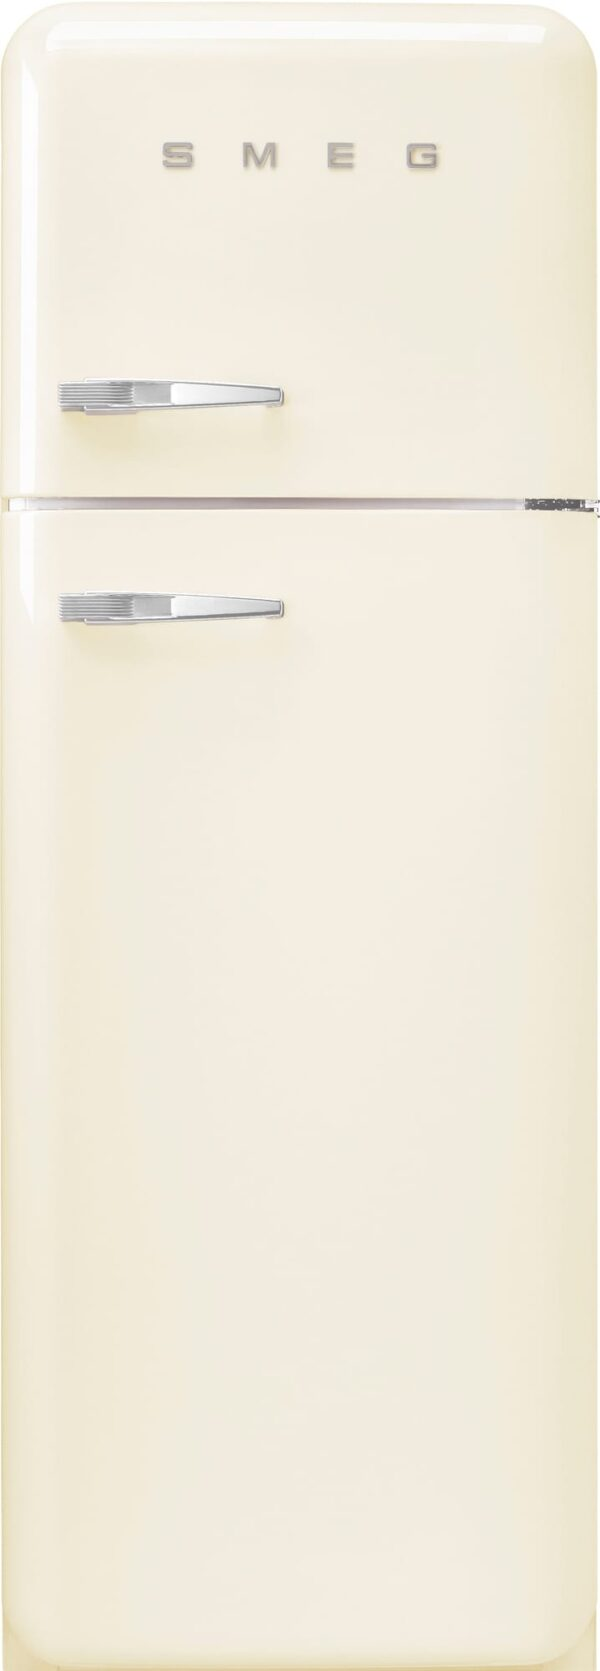 Smeg 50's Style kølefryseskab FAB30RCR5 (cream)